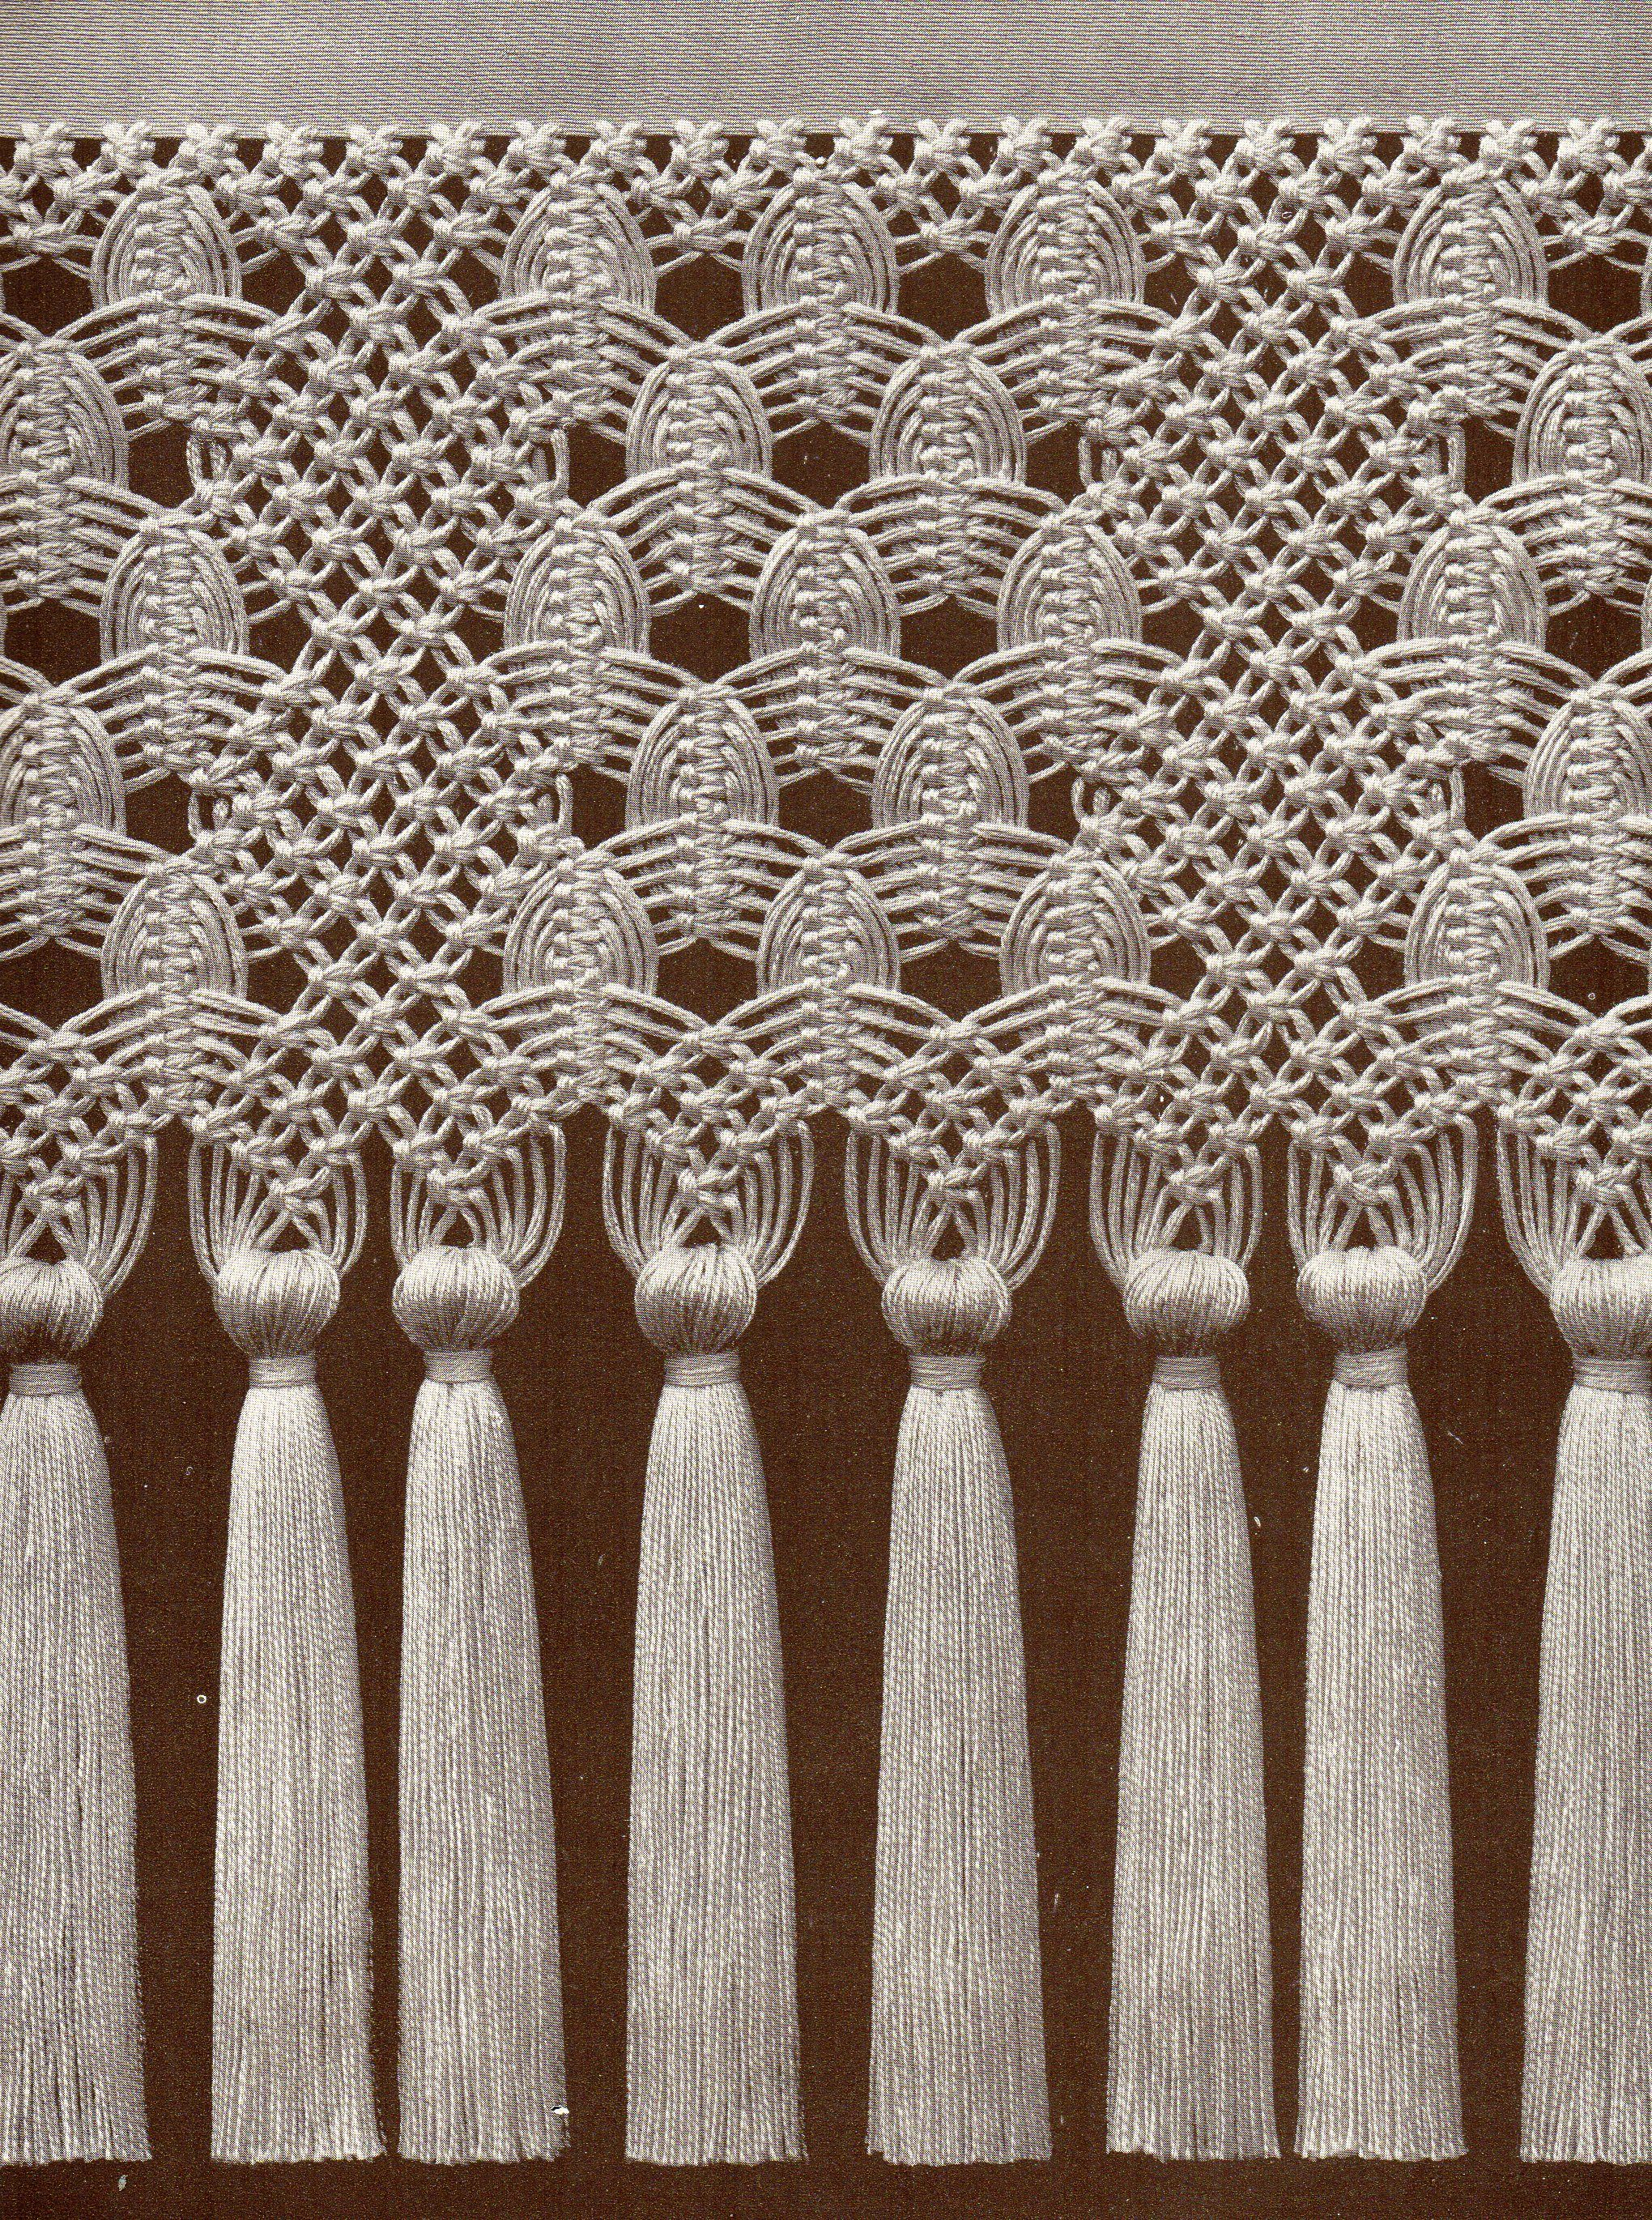 Macrame macrane pinterest macram tapices y proyectos - Tapices de macrame ...